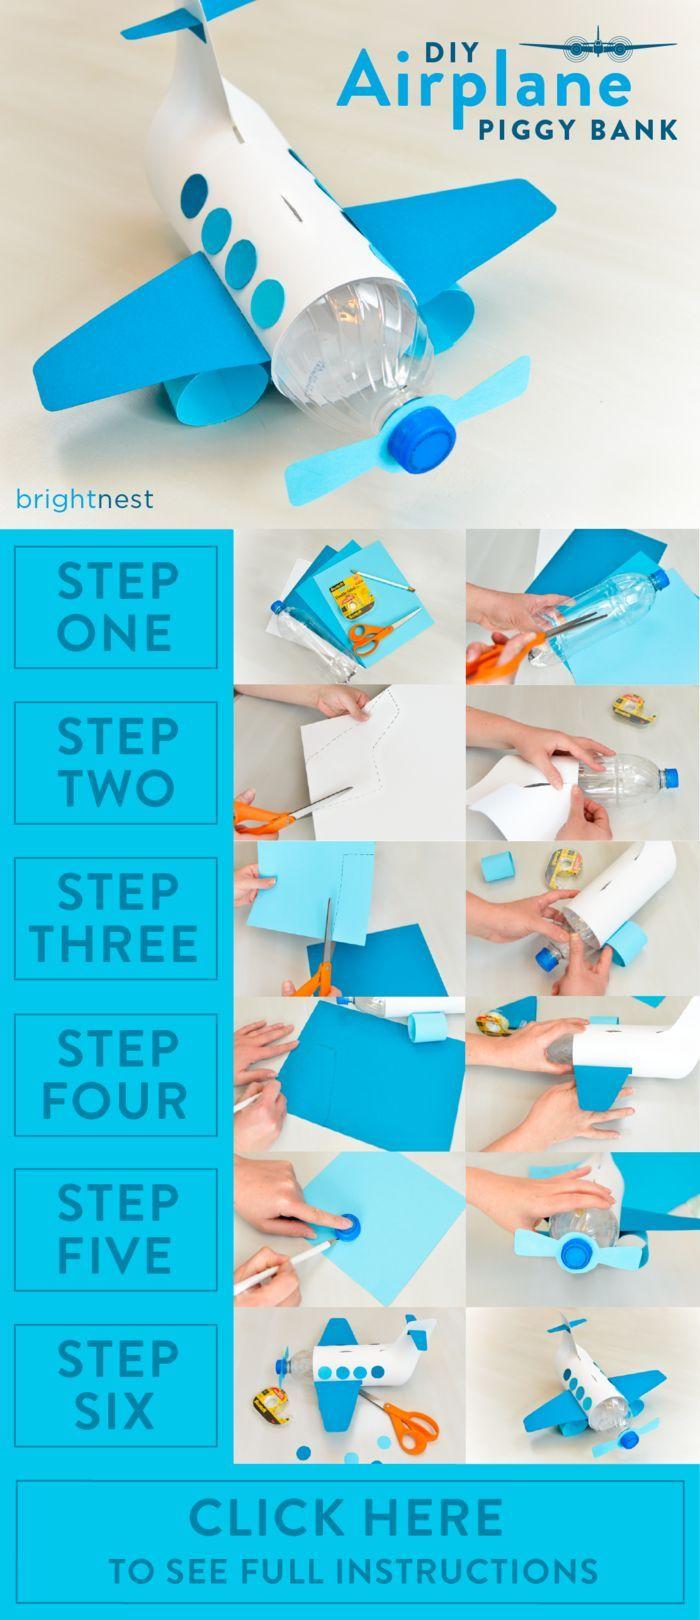 BrightNest | Crafts For Kids: Make a Unique Piggy Bank out of a Plastic Bottle! See the full #DIY on http://BrightNest.com